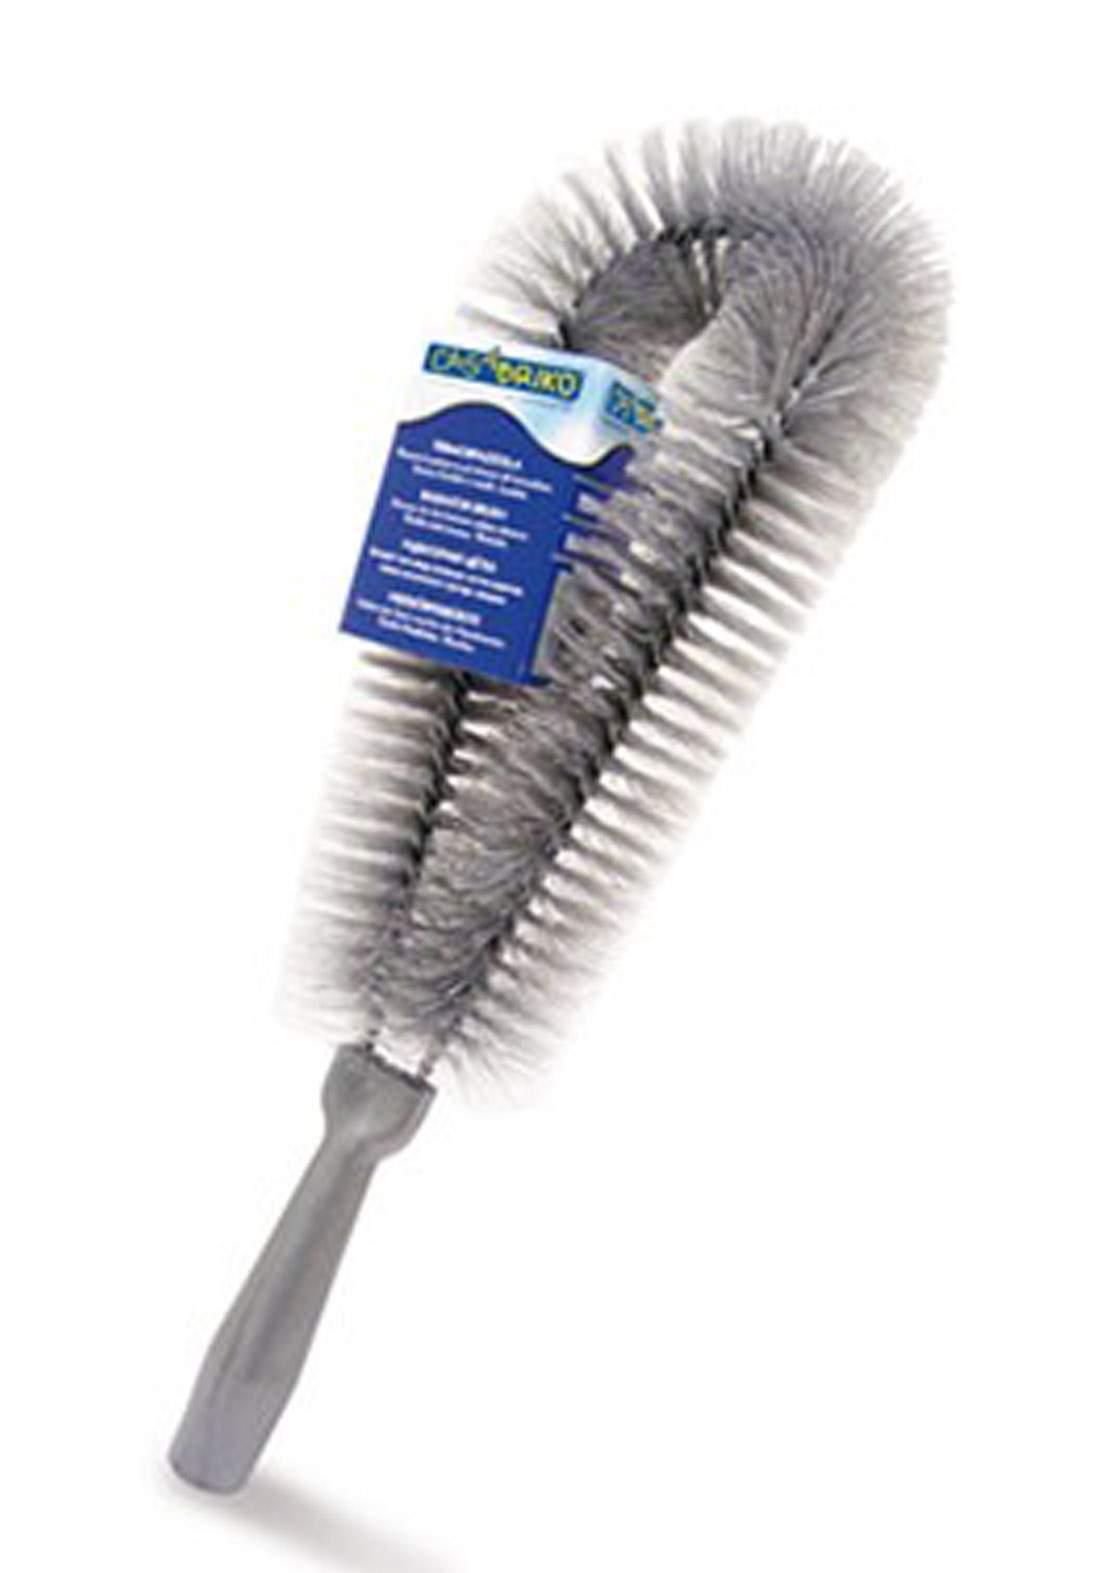 Casabriko Cleansing Termosifoni Broom فرشاة تنظيف